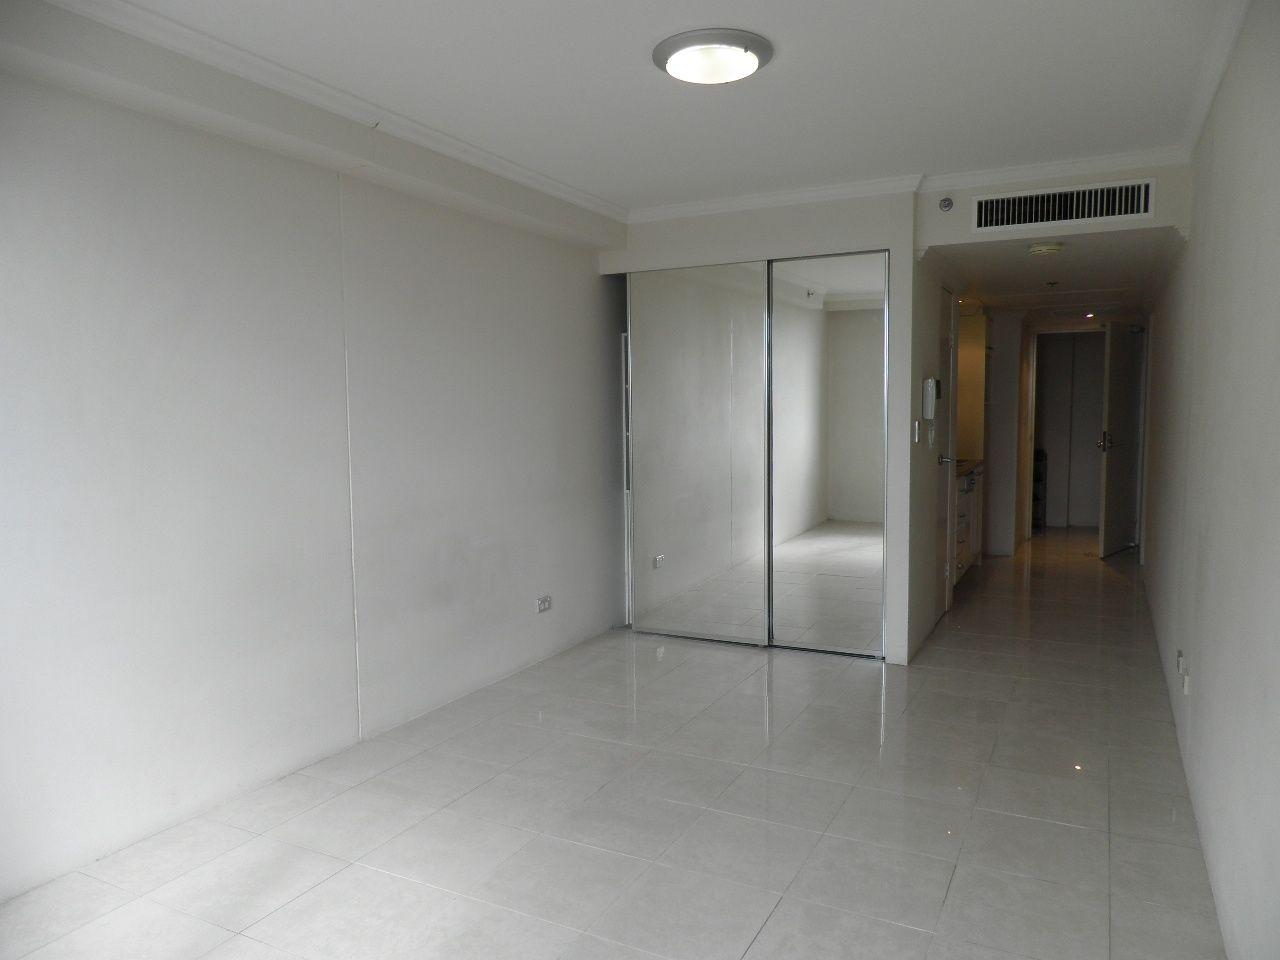 101B/14 Brown Street, Chatswood NSW 2067, Image 1